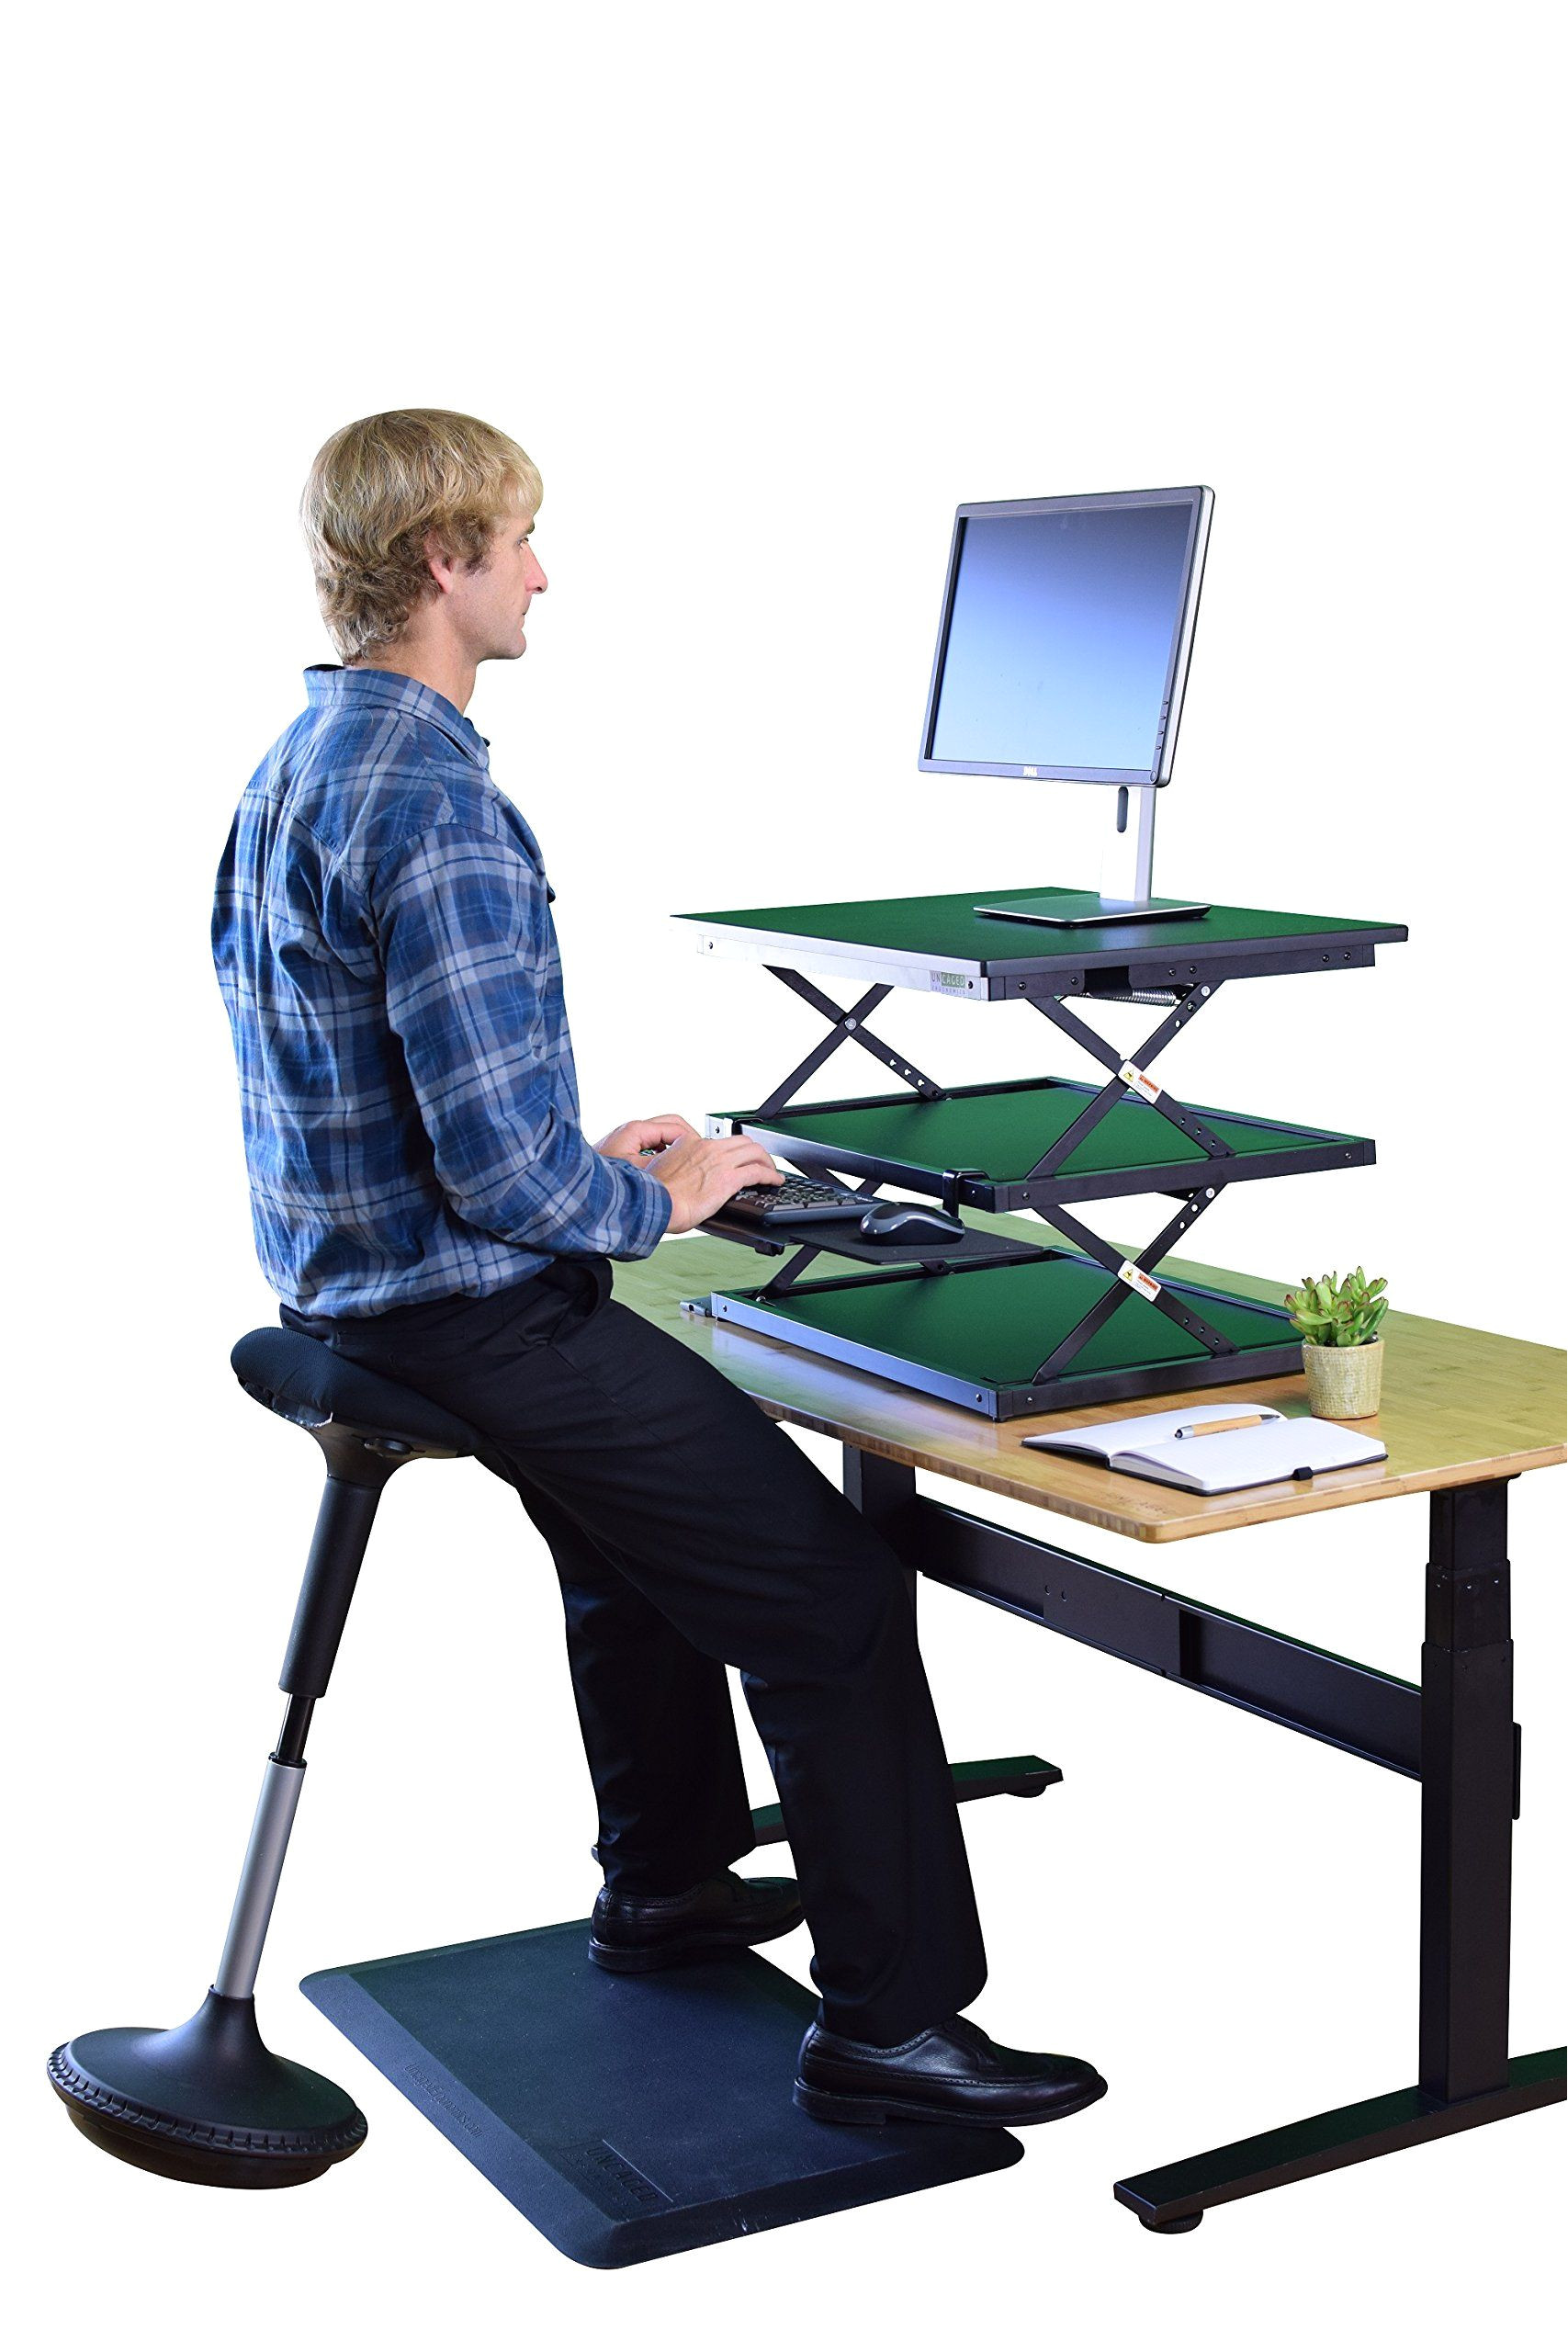 ergonomic stand up desk elegant wobble stool adjustable height active sitting balance chair for